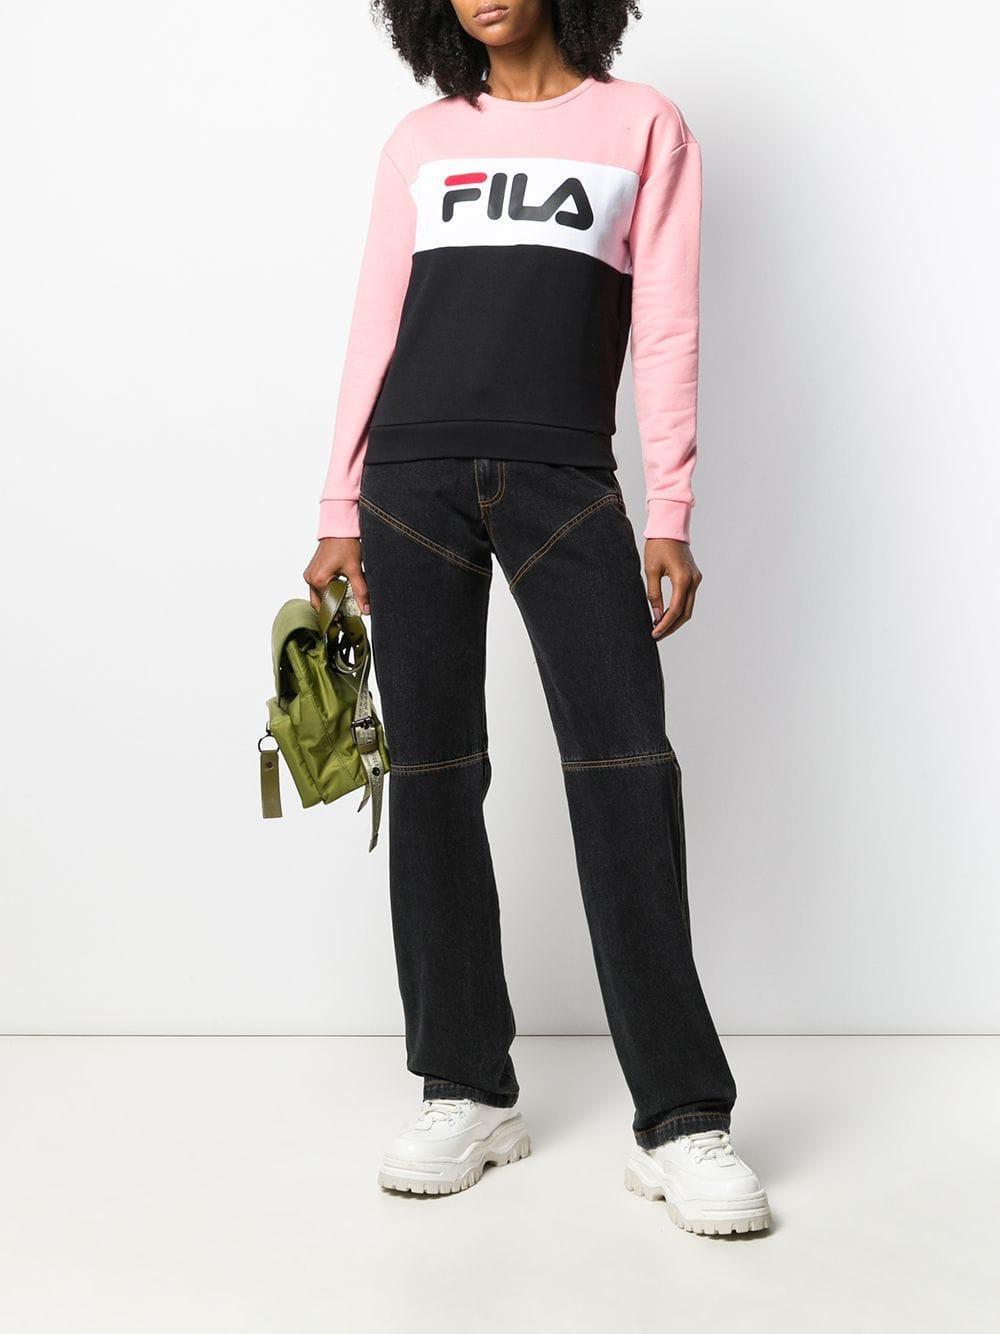 Sweat Leah Coton Fila en coloris Rose